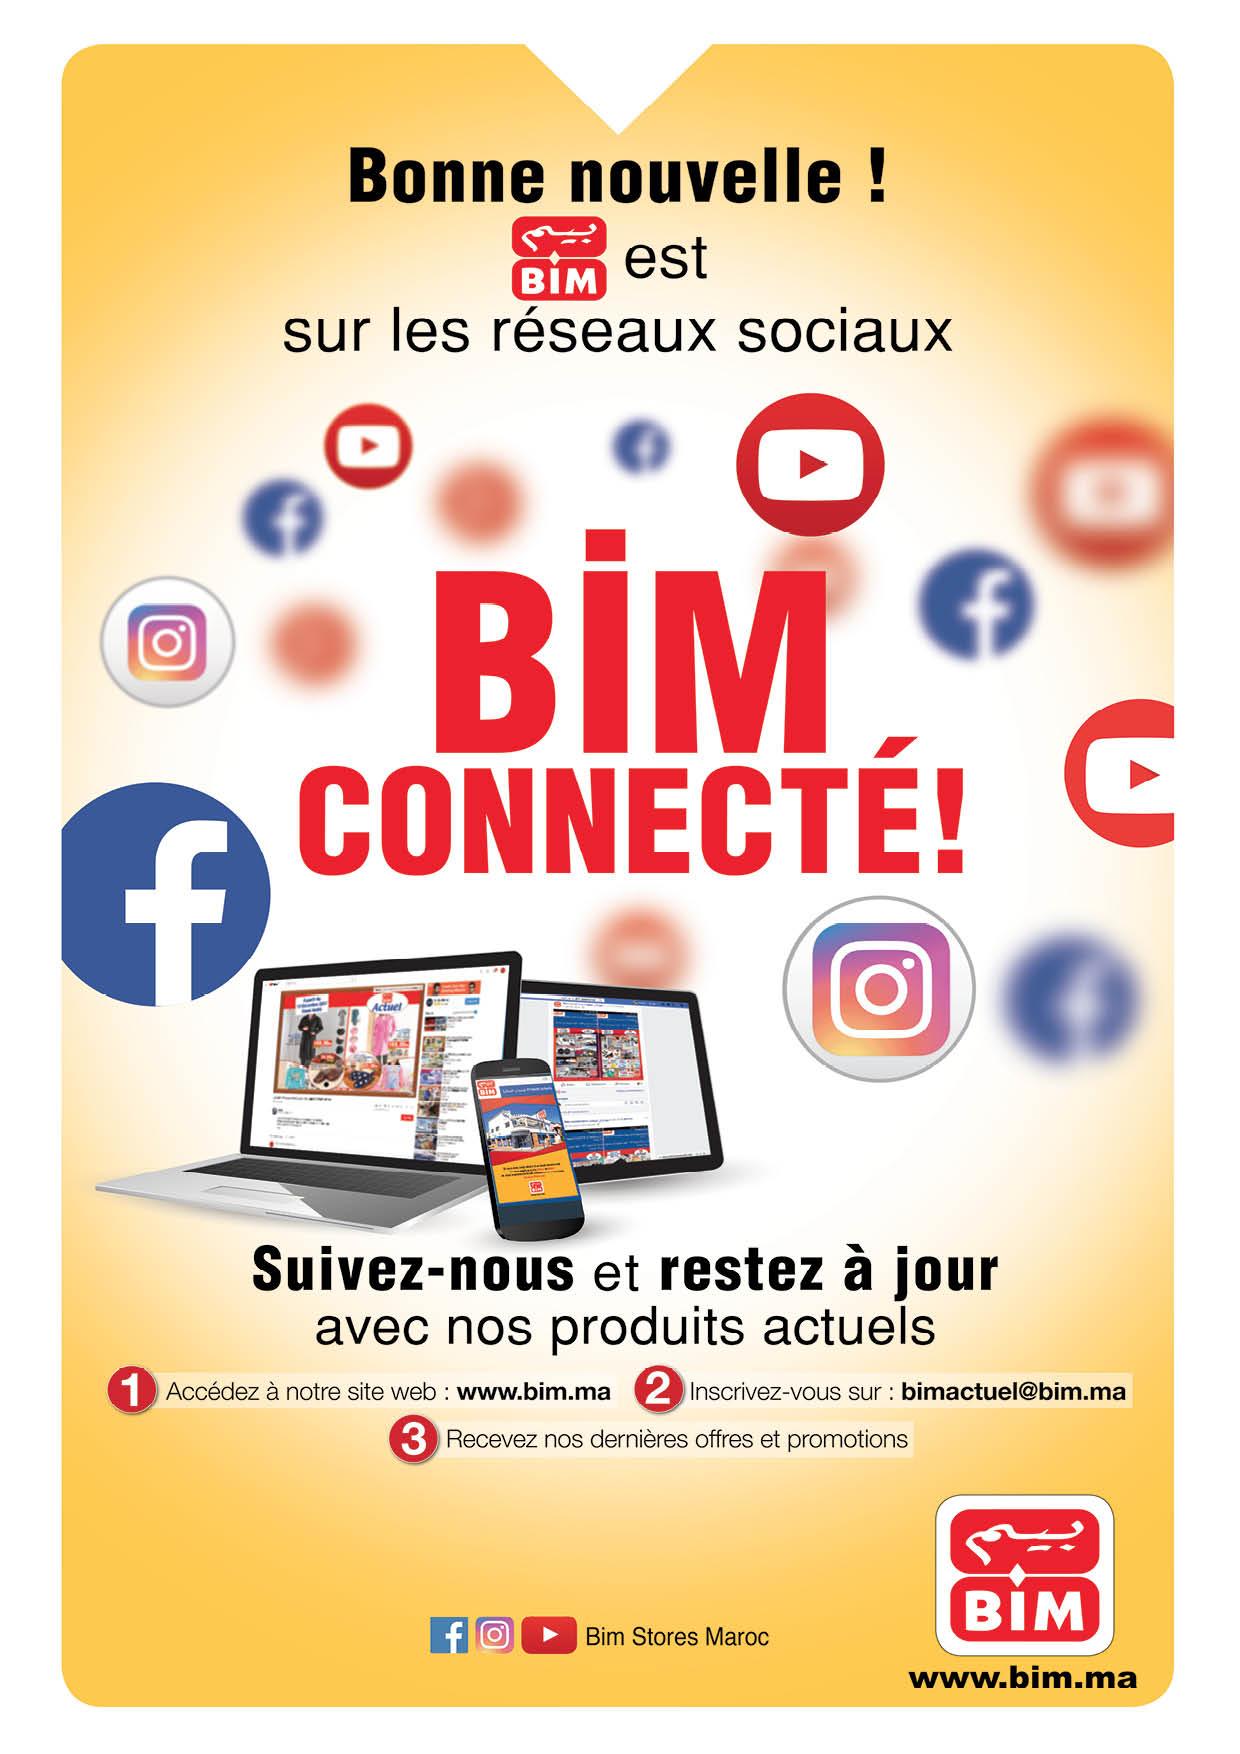 catalogue bim rentr e scolaire vendredi 31 ao t 2018 promotion au maroc page 5. Black Bedroom Furniture Sets. Home Design Ideas